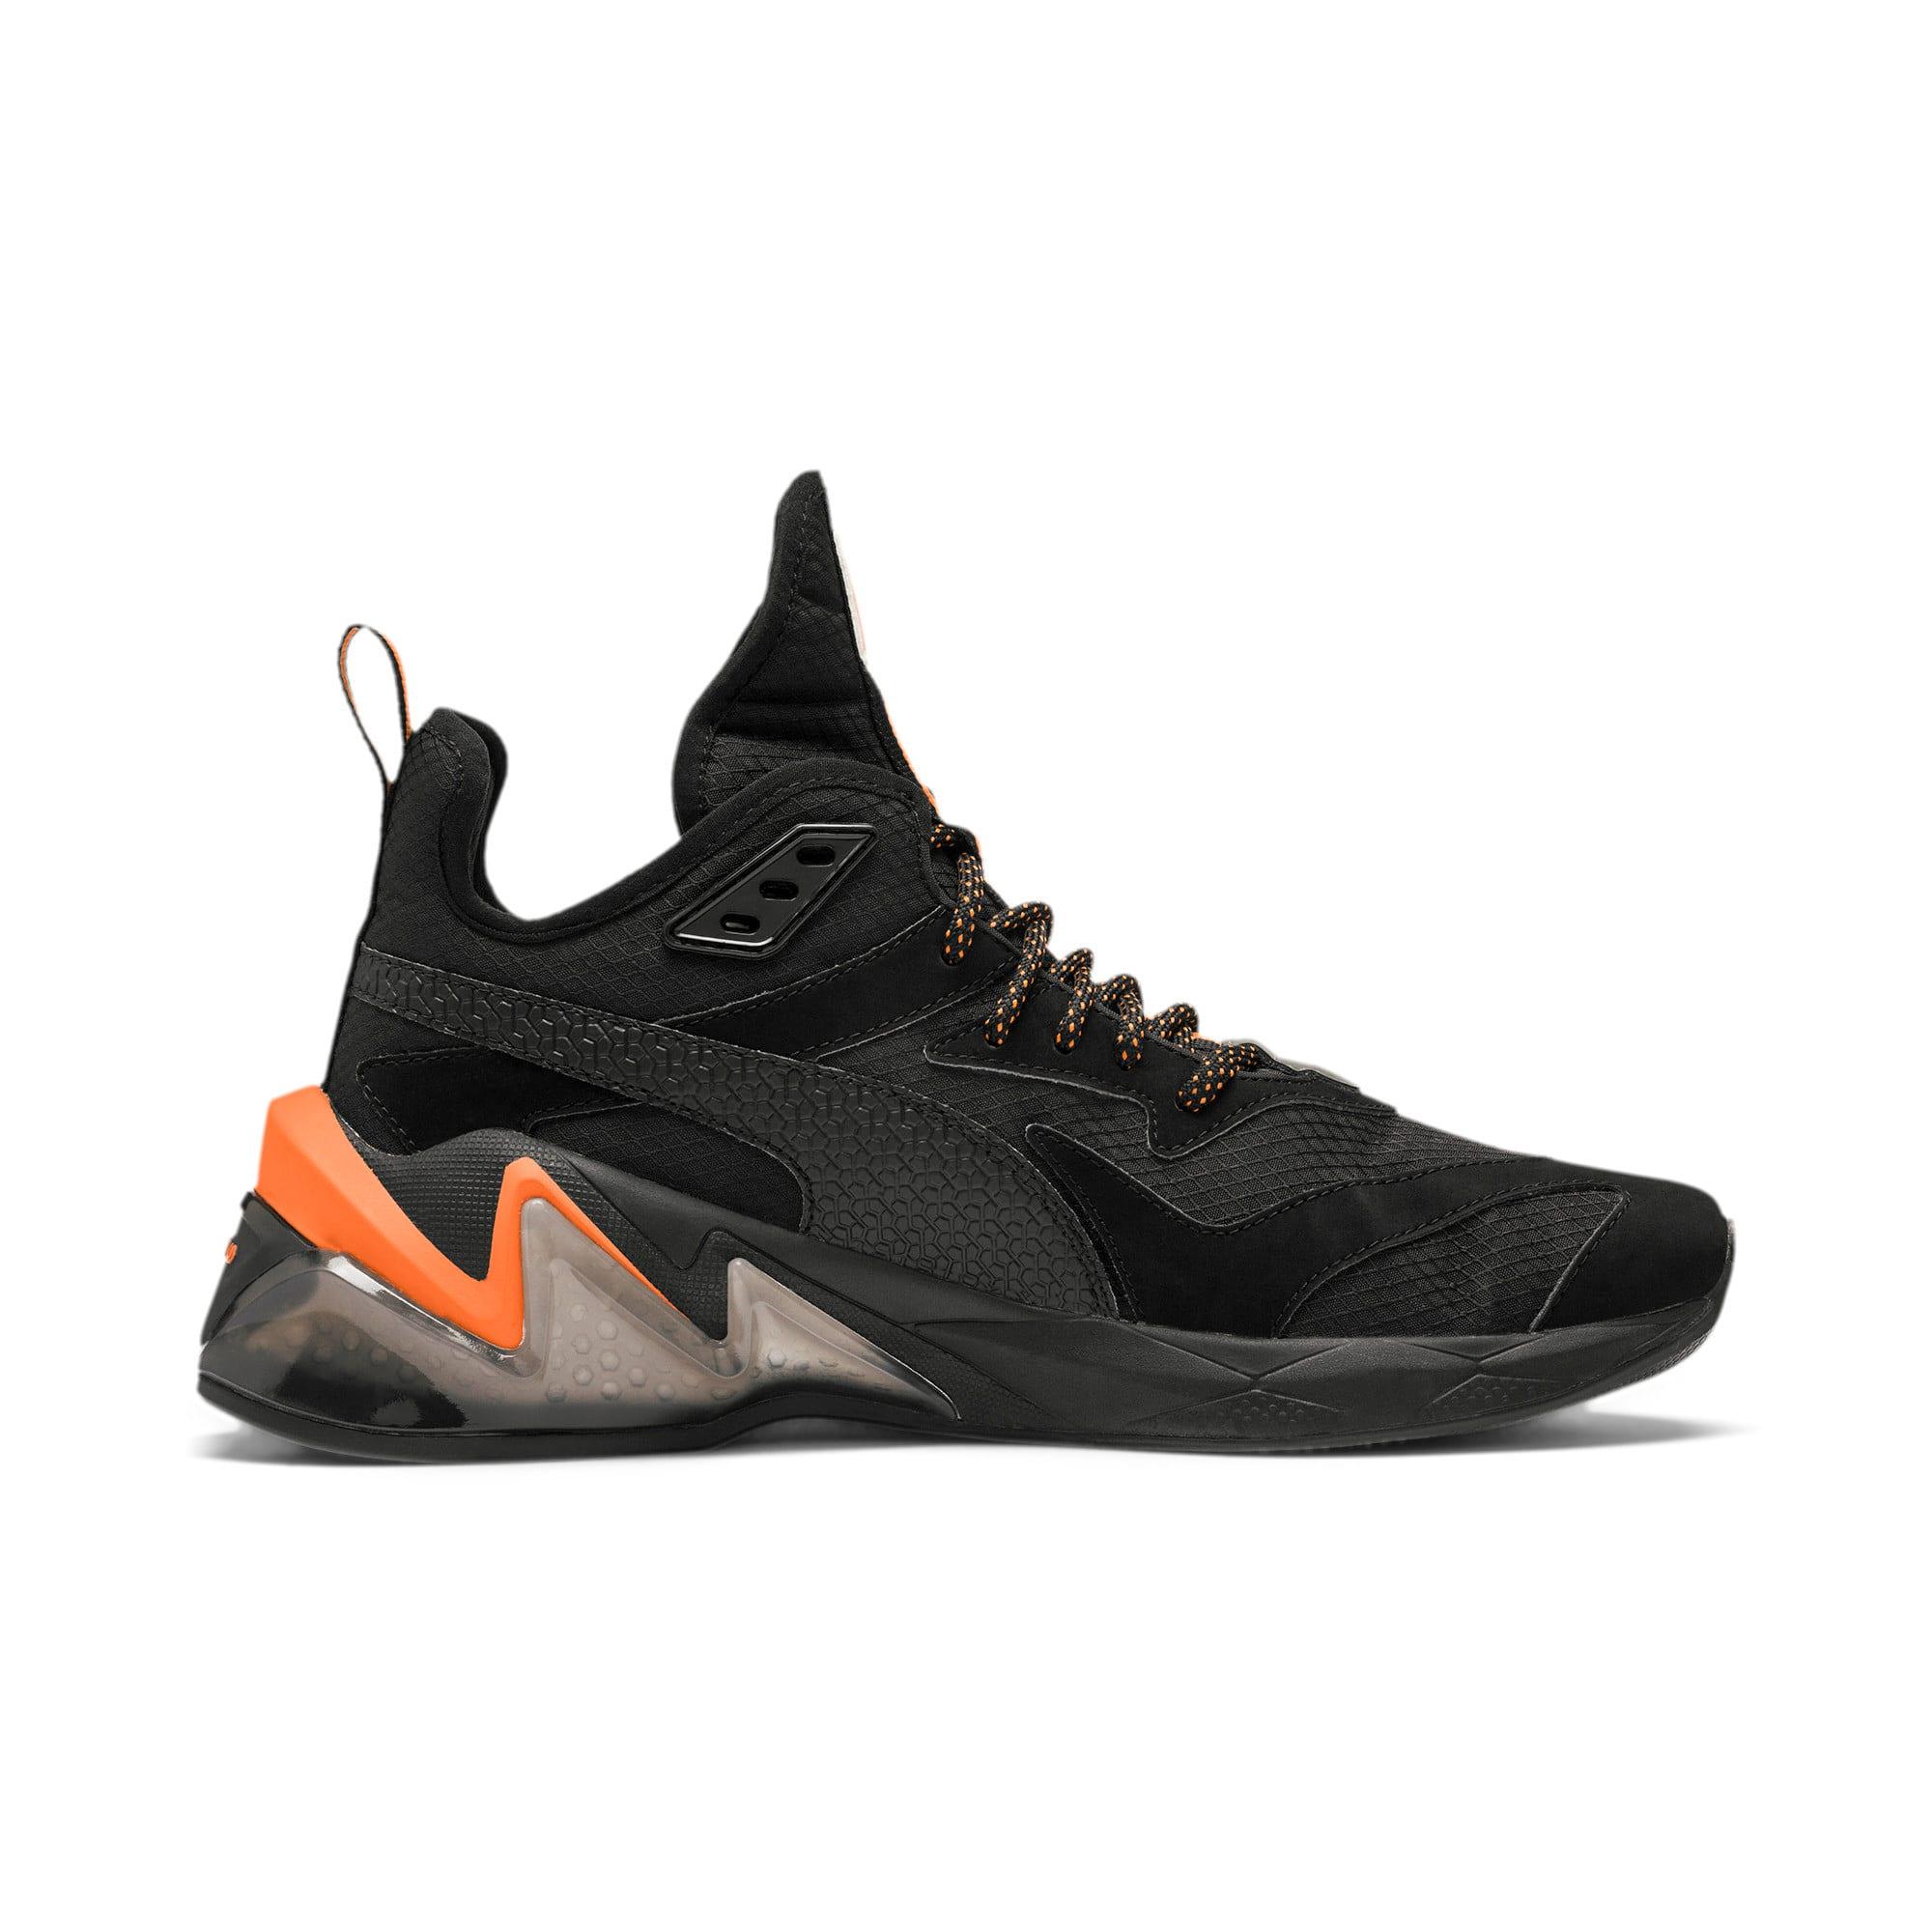 Thumbnail 6 of LQDCELL Origin Terrain Men's Training Shoes, Puma Black-Jaffa Orange, medium